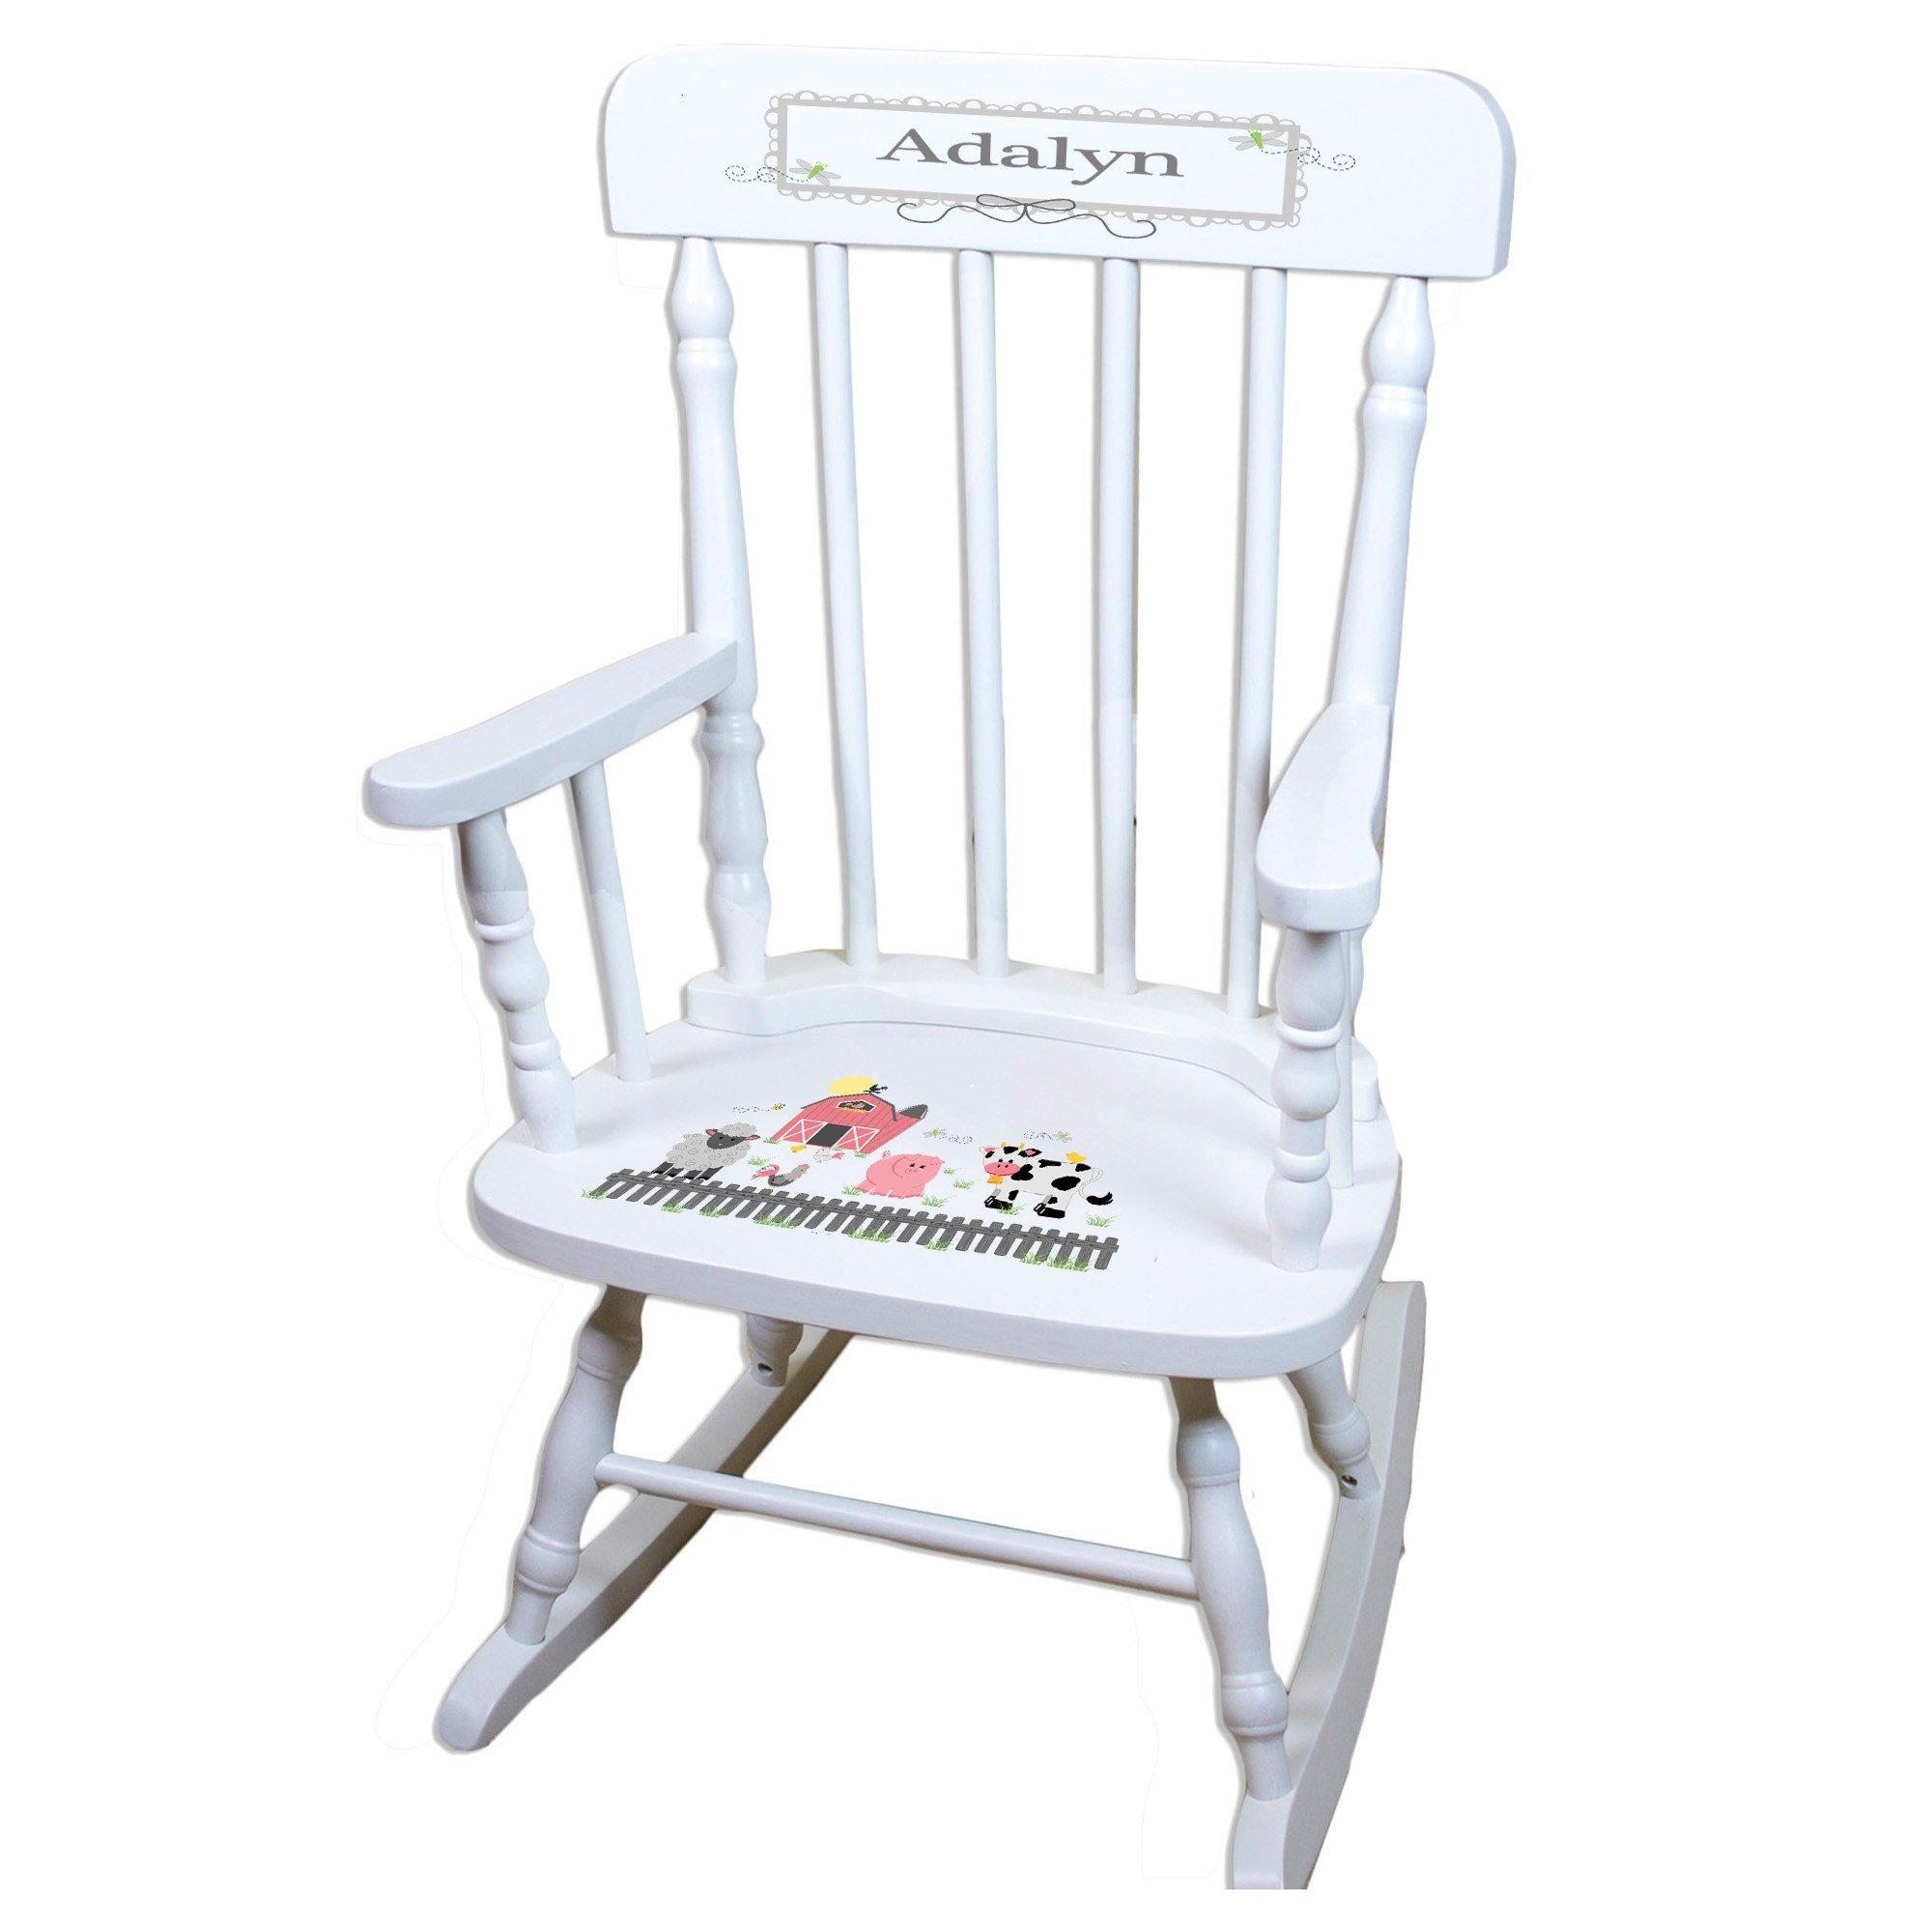 MyBambino Personalized Barnyard Friends Pastel White Wooden Childrens Rocking Chair